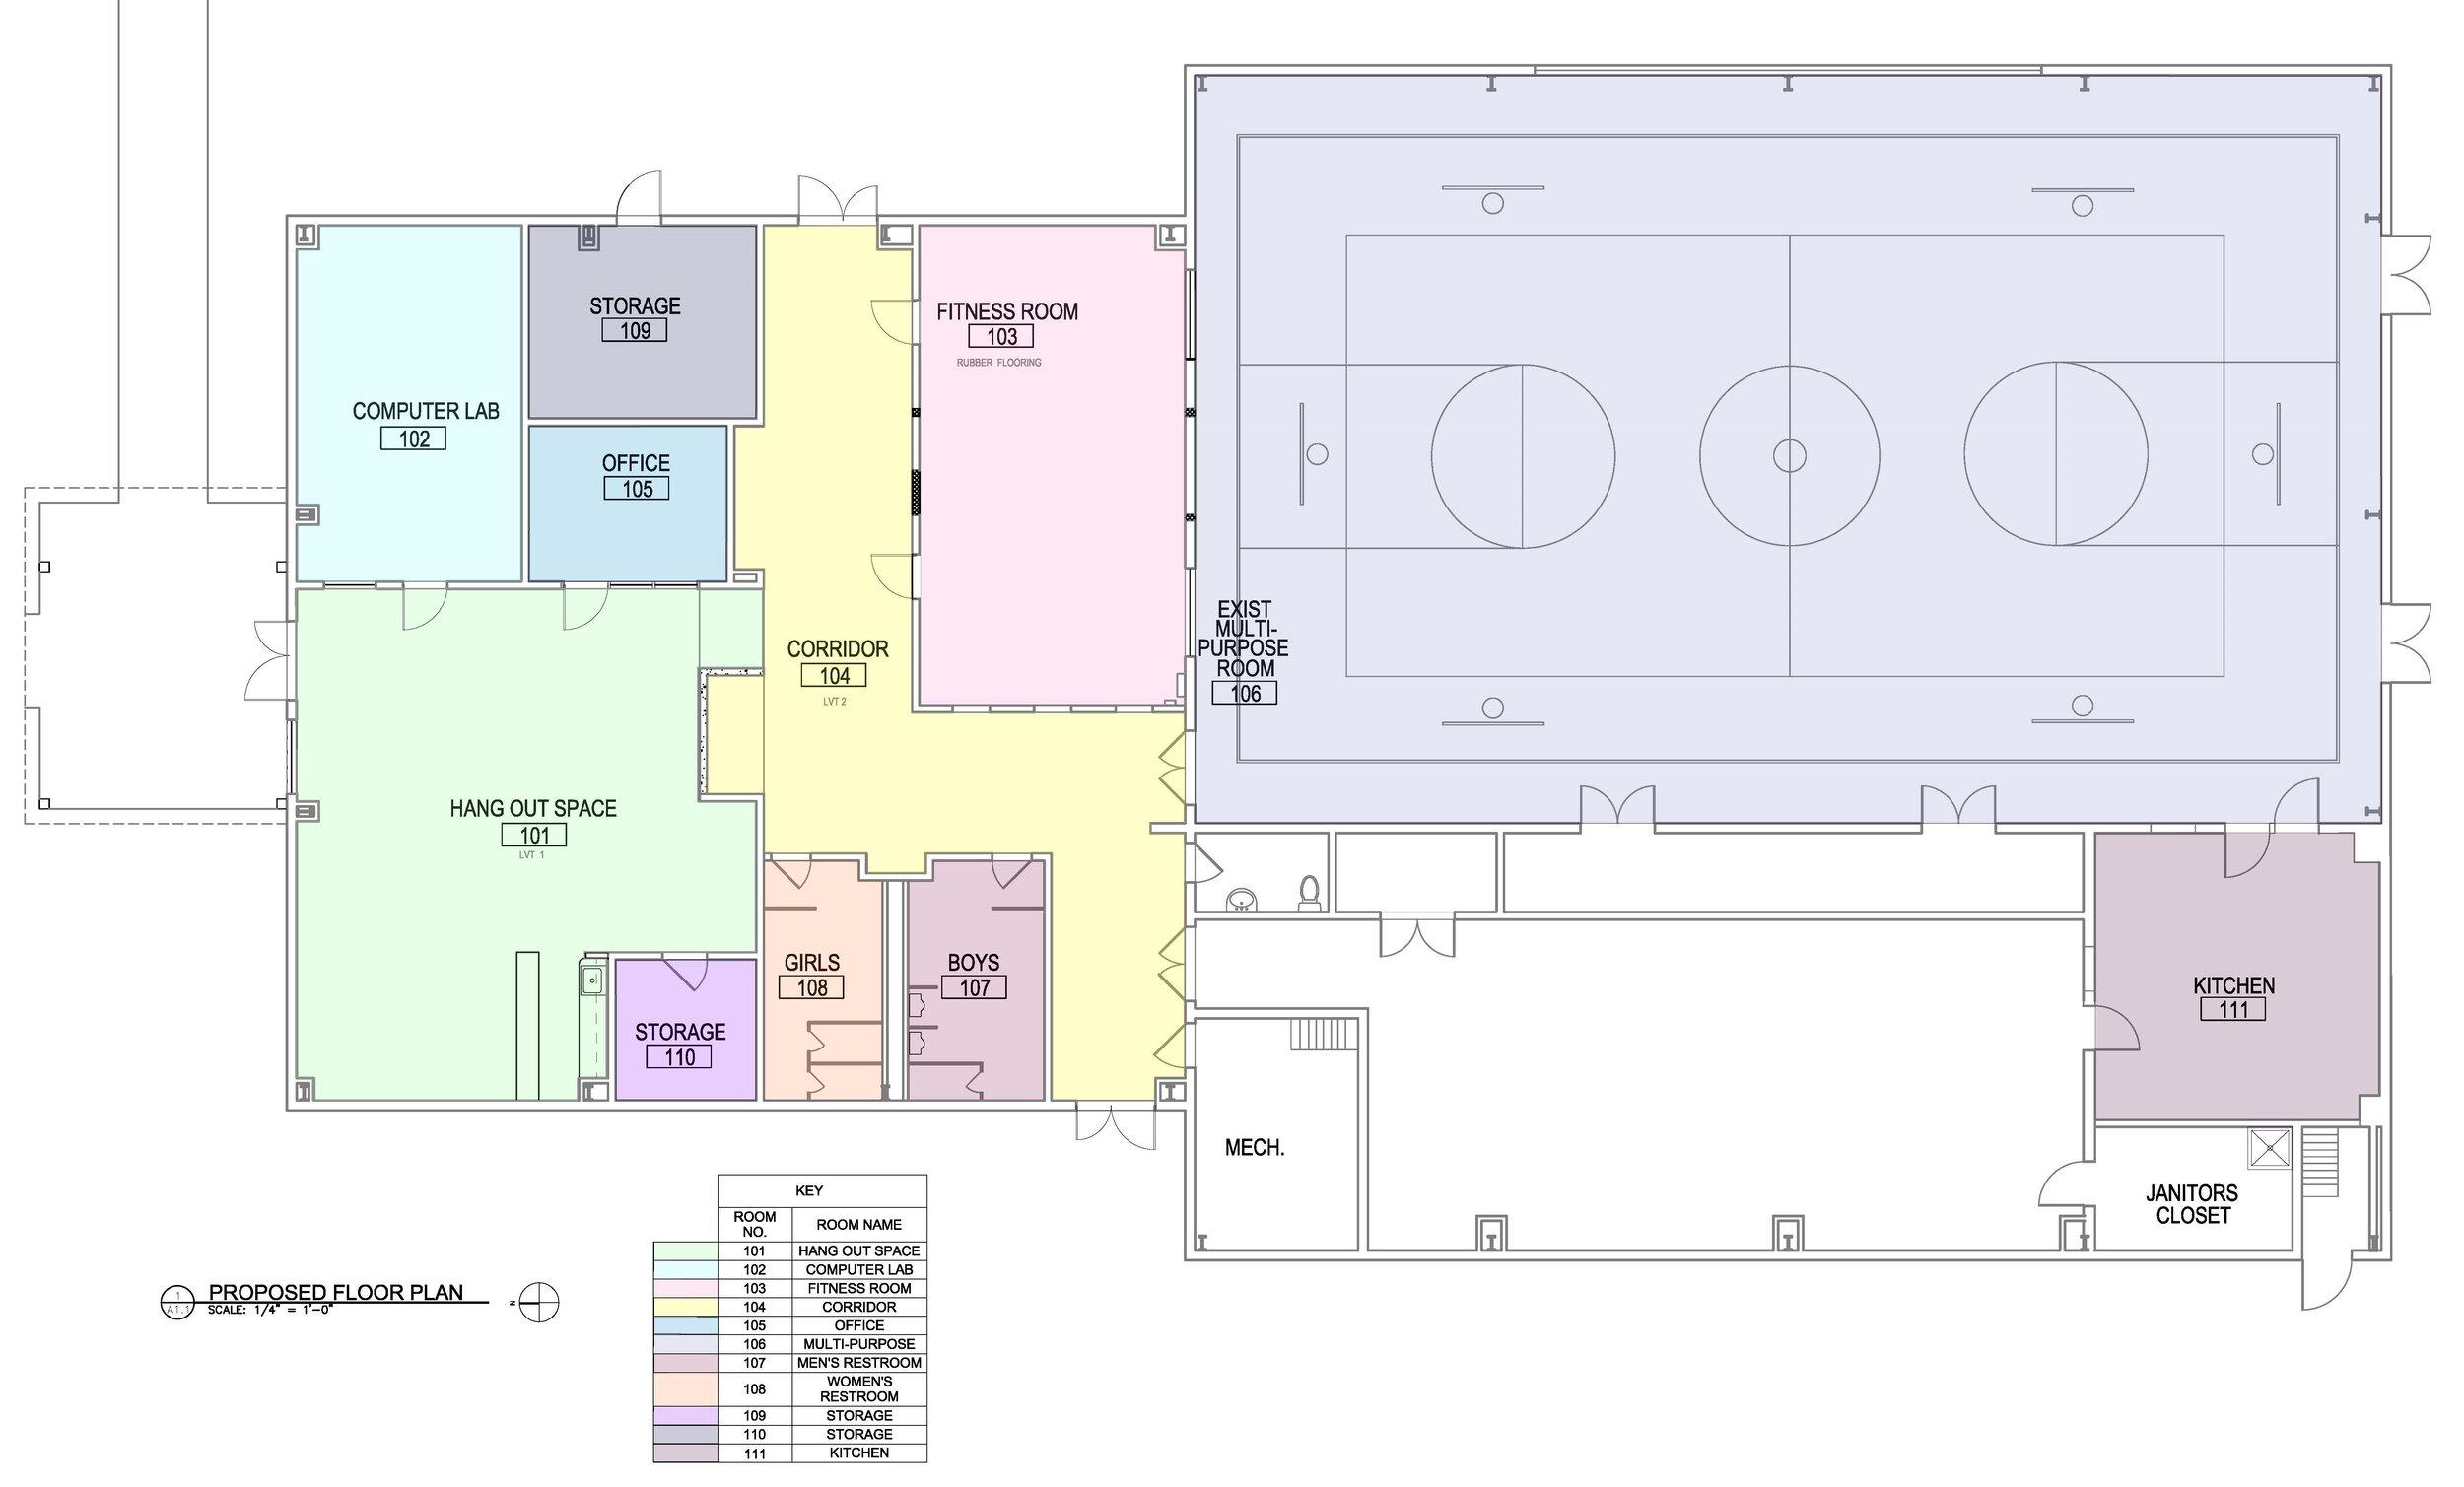 BCRP Towanda Proposed Floor Plan